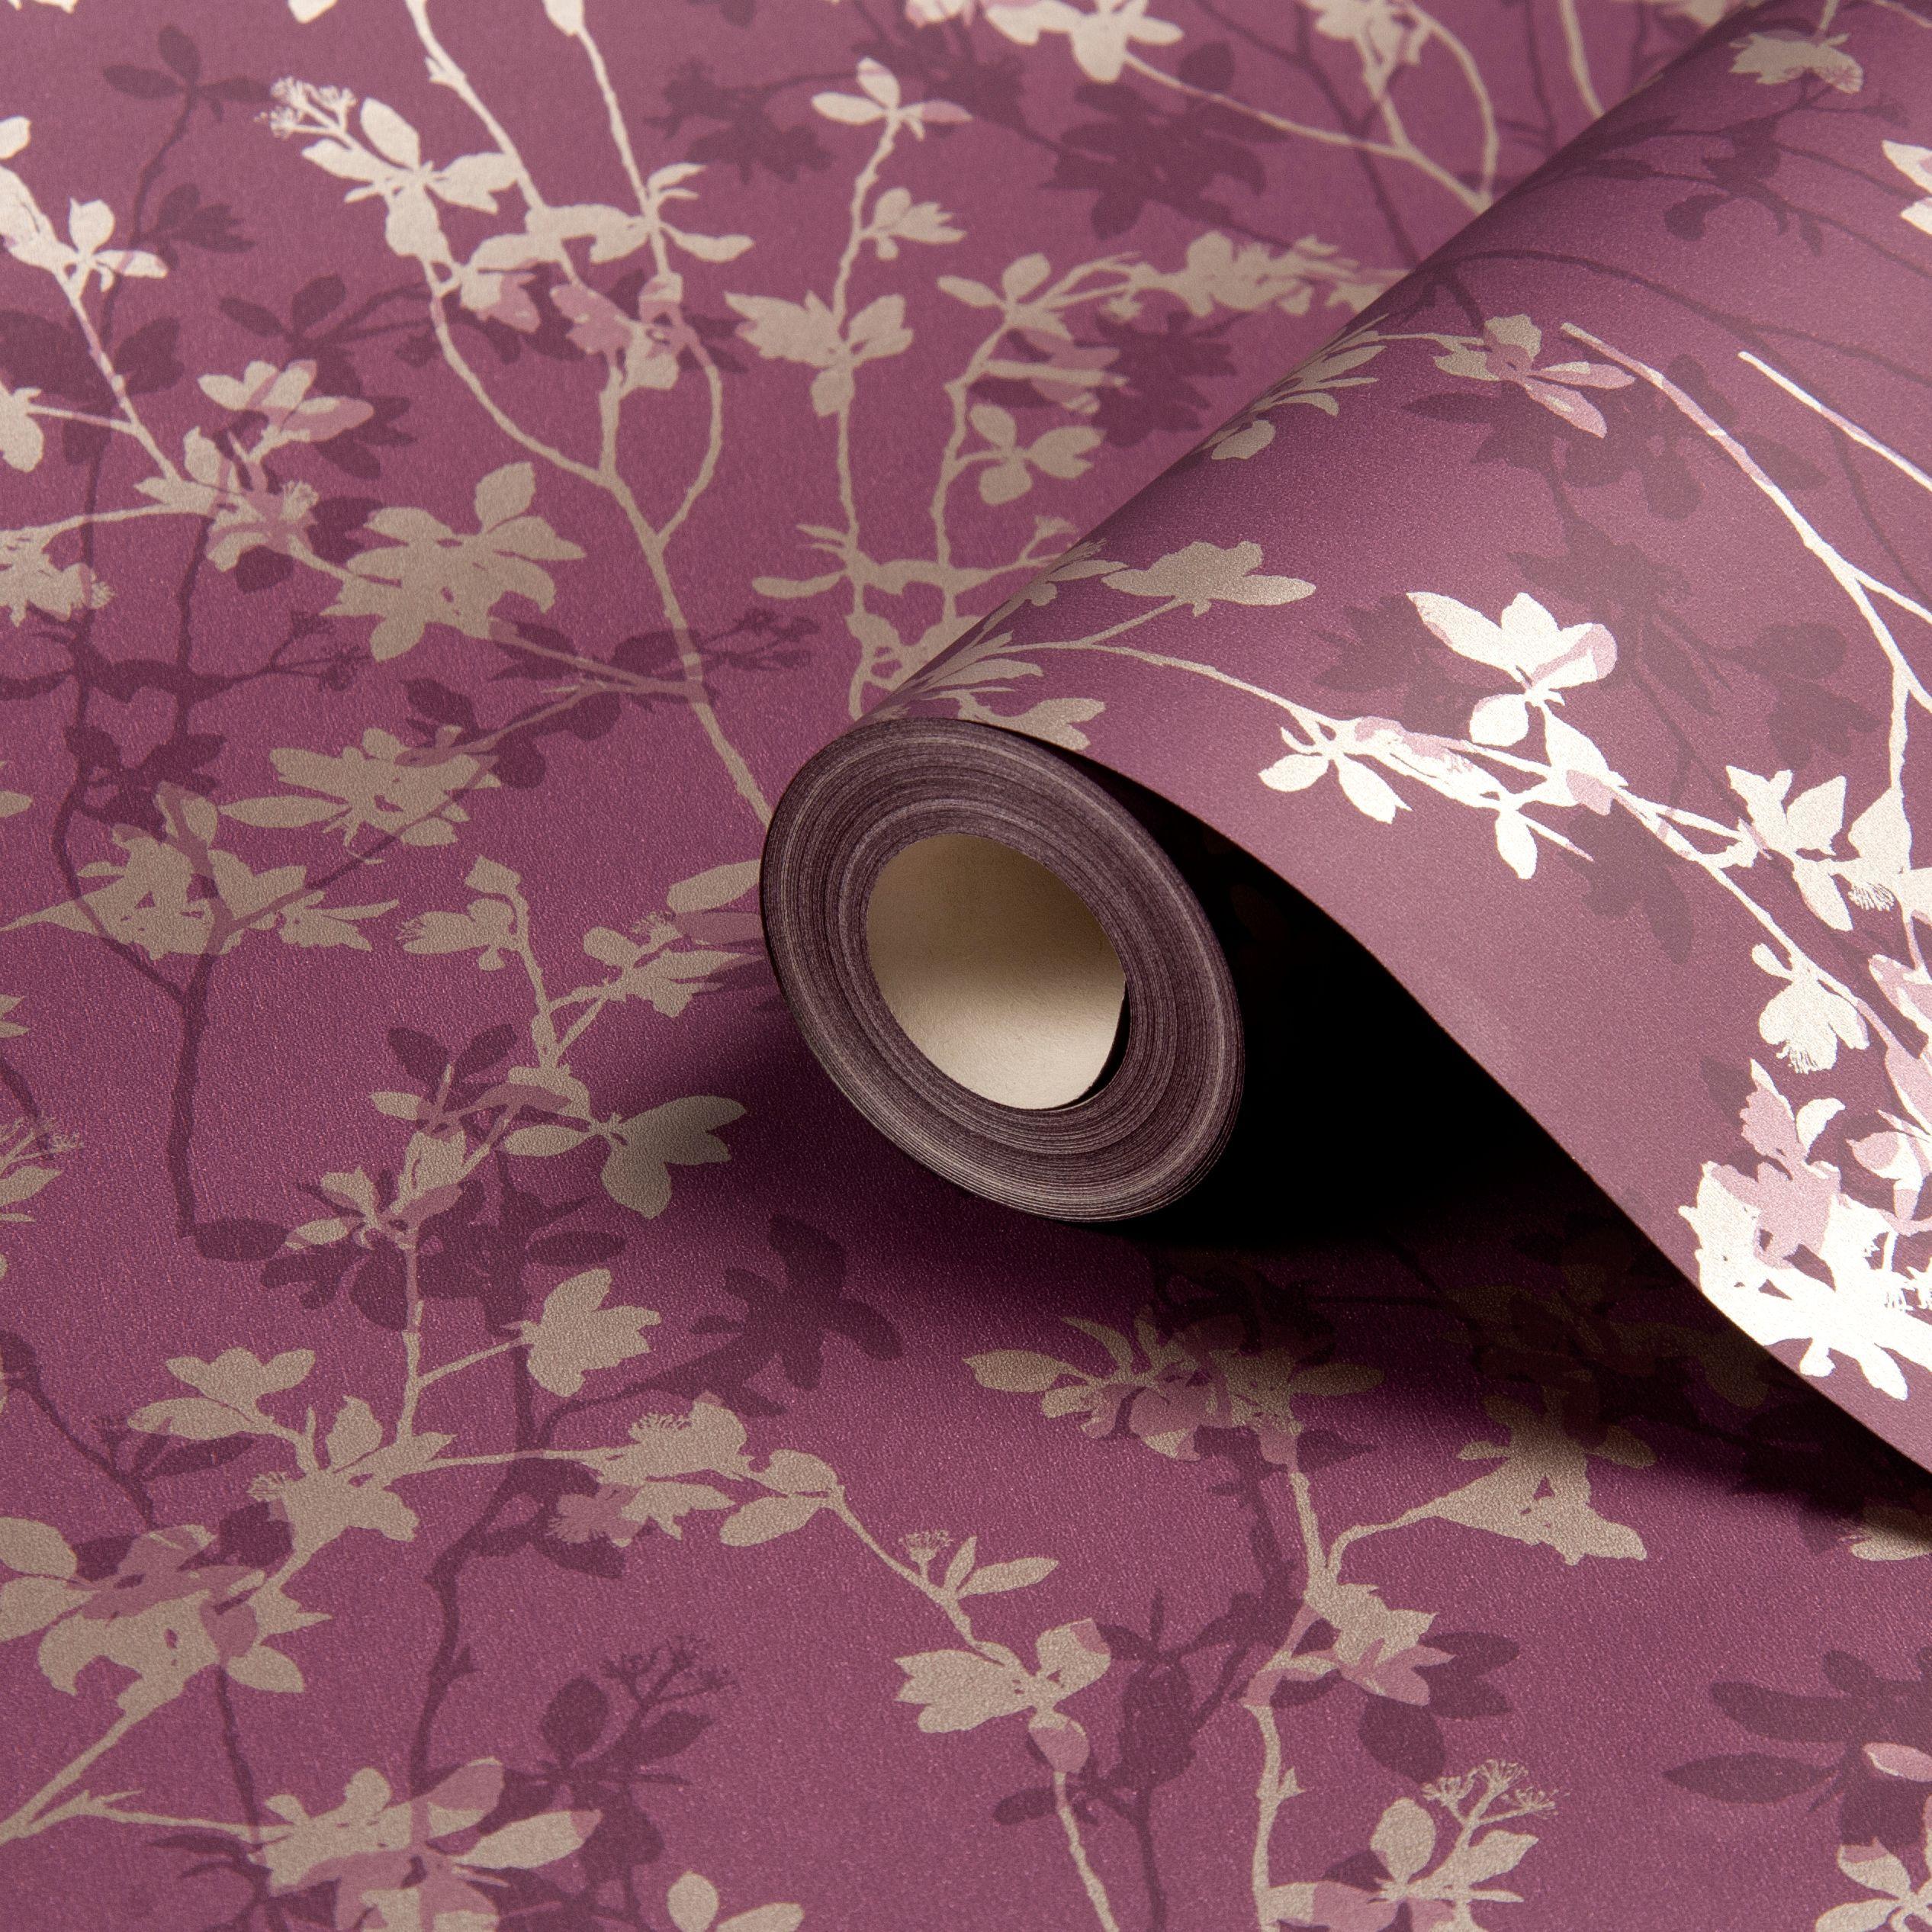 Morning Shadow Plum Wallpaper Departments Diy At B Q Plum Wallpaper Purple Bedroom Design Diy Wallpaper